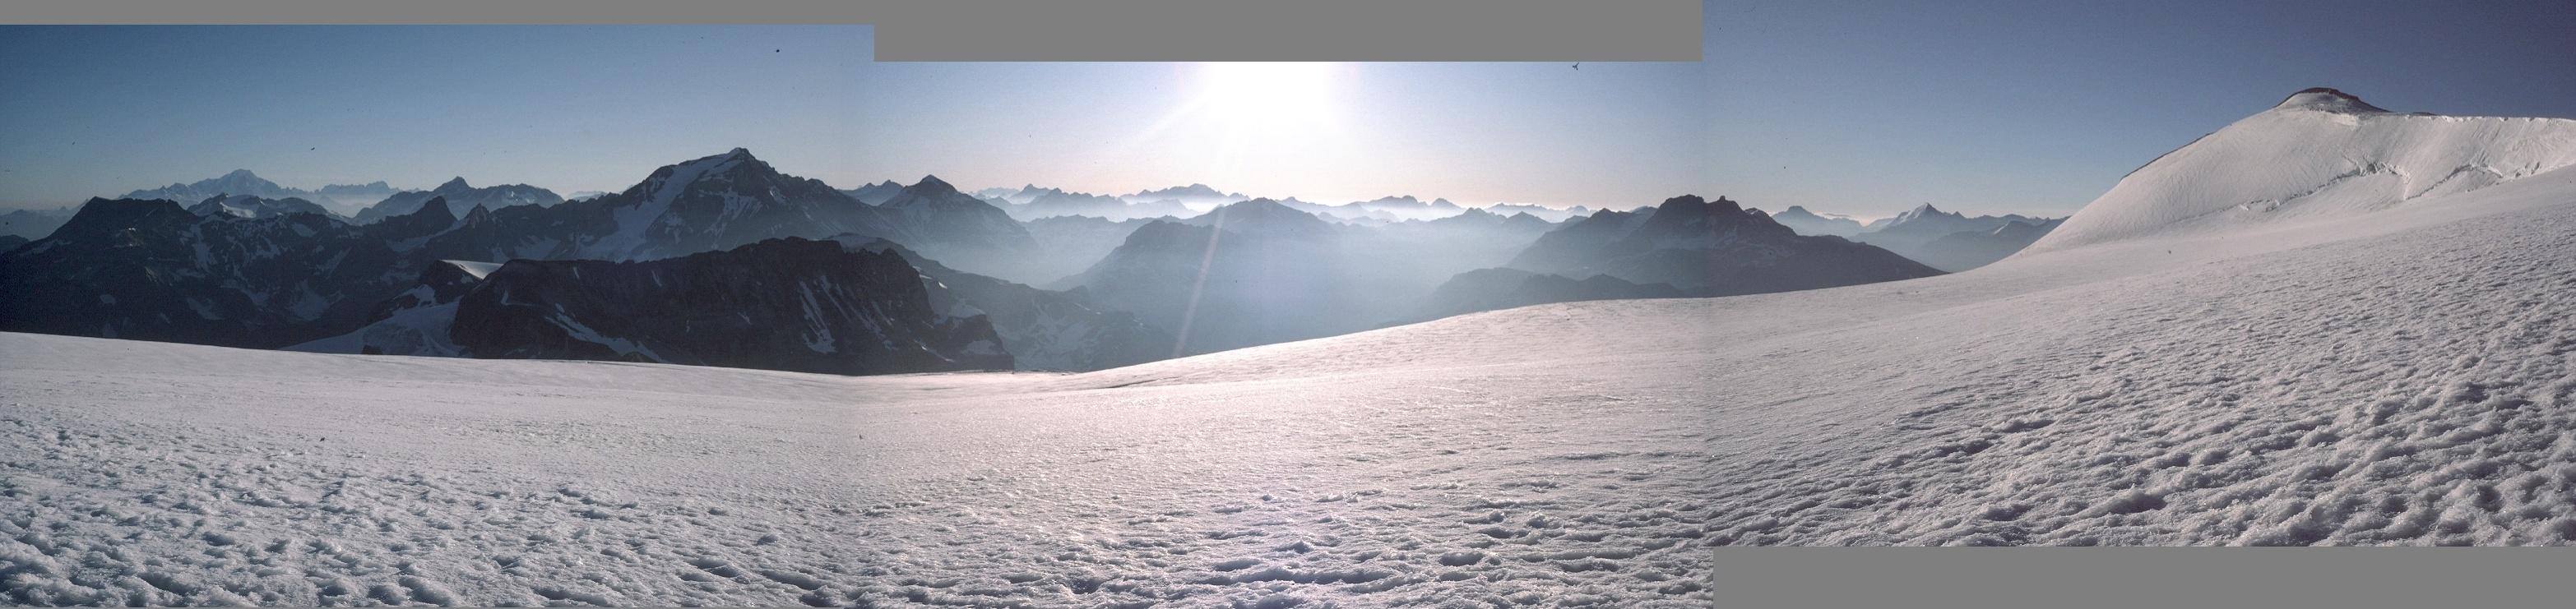 scenic photos photos panoramiques montagne. Black Bedroom Furniture Sets. Home Design Ideas